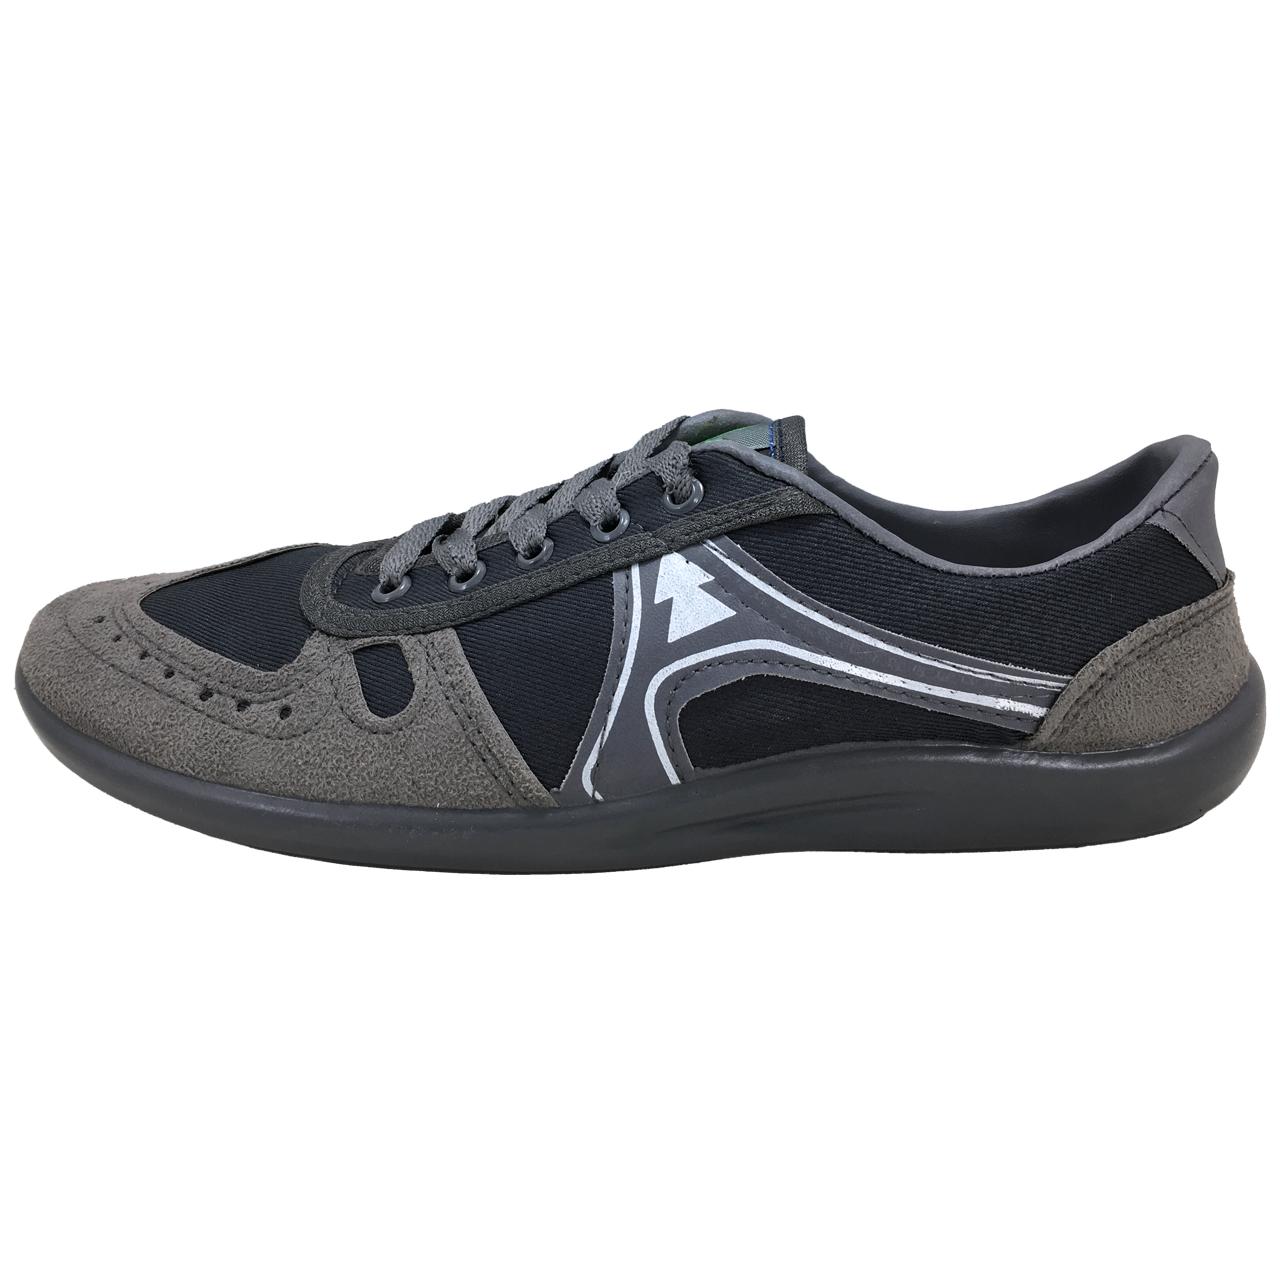 قیمت کفش فوتسال مردانه مدل آلفا کویر کد 2789